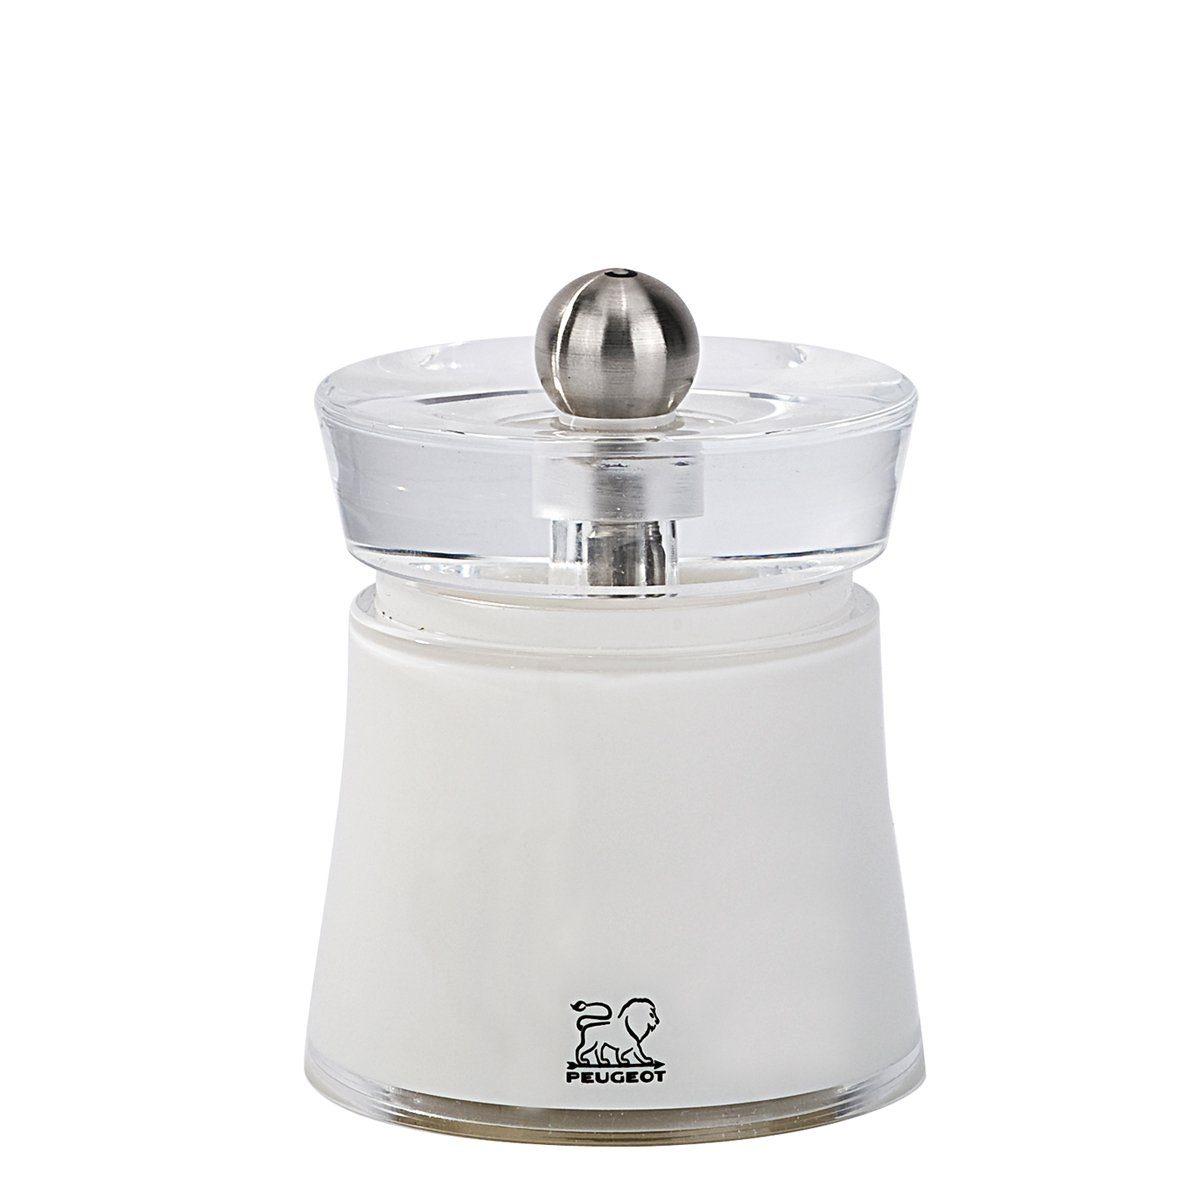 PEUGEOT Peugeot Salzmühle BALI 8cm weiß